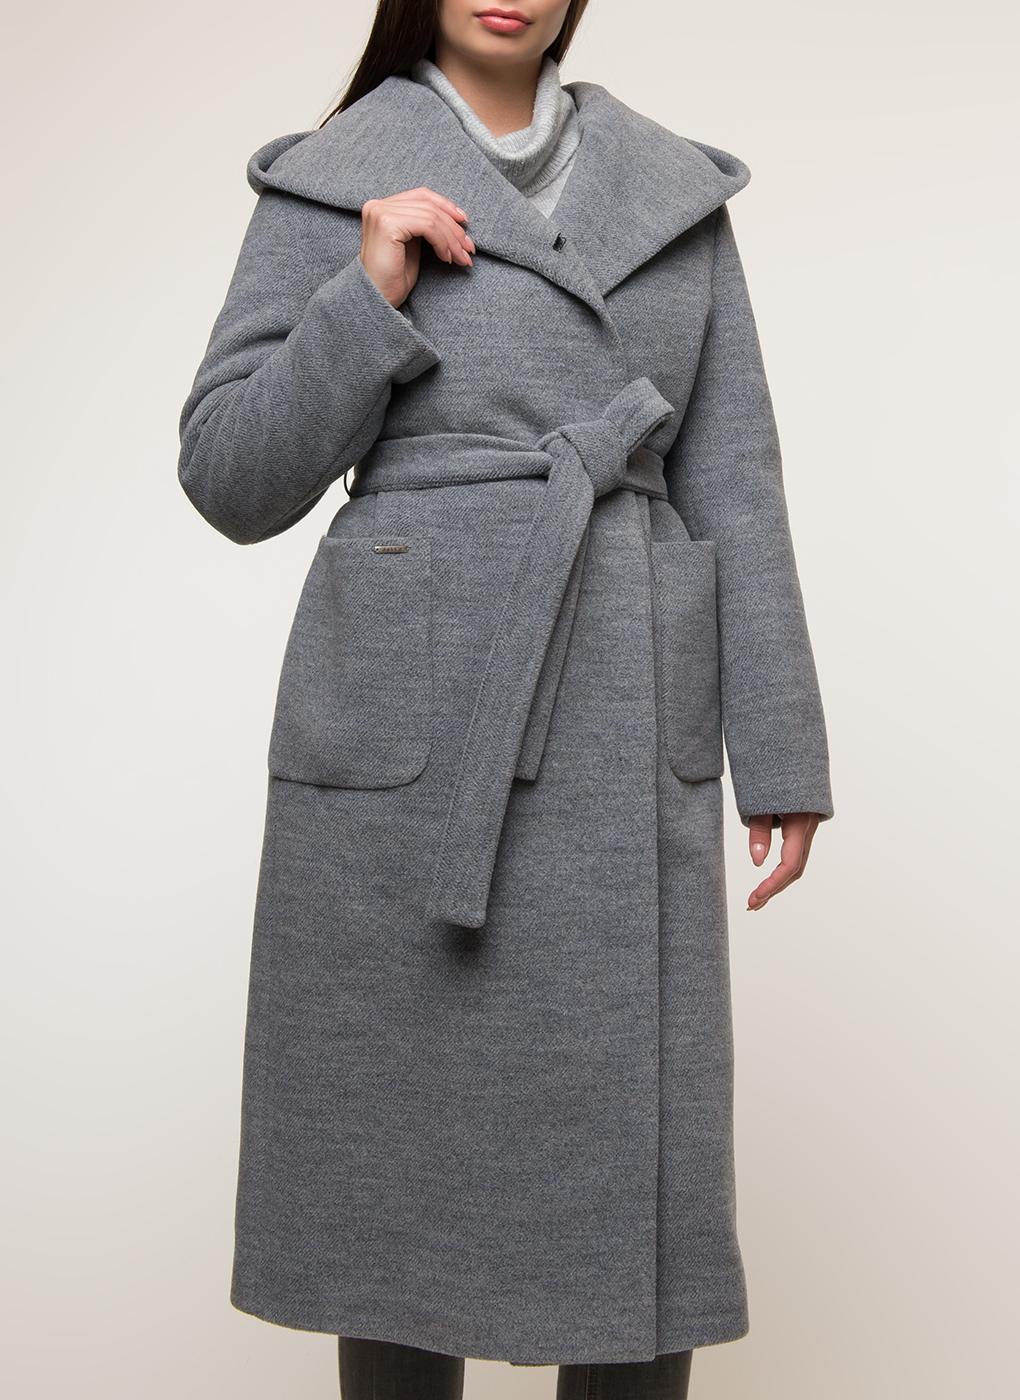 Пальто прямое шерстяное 55, idekka фото